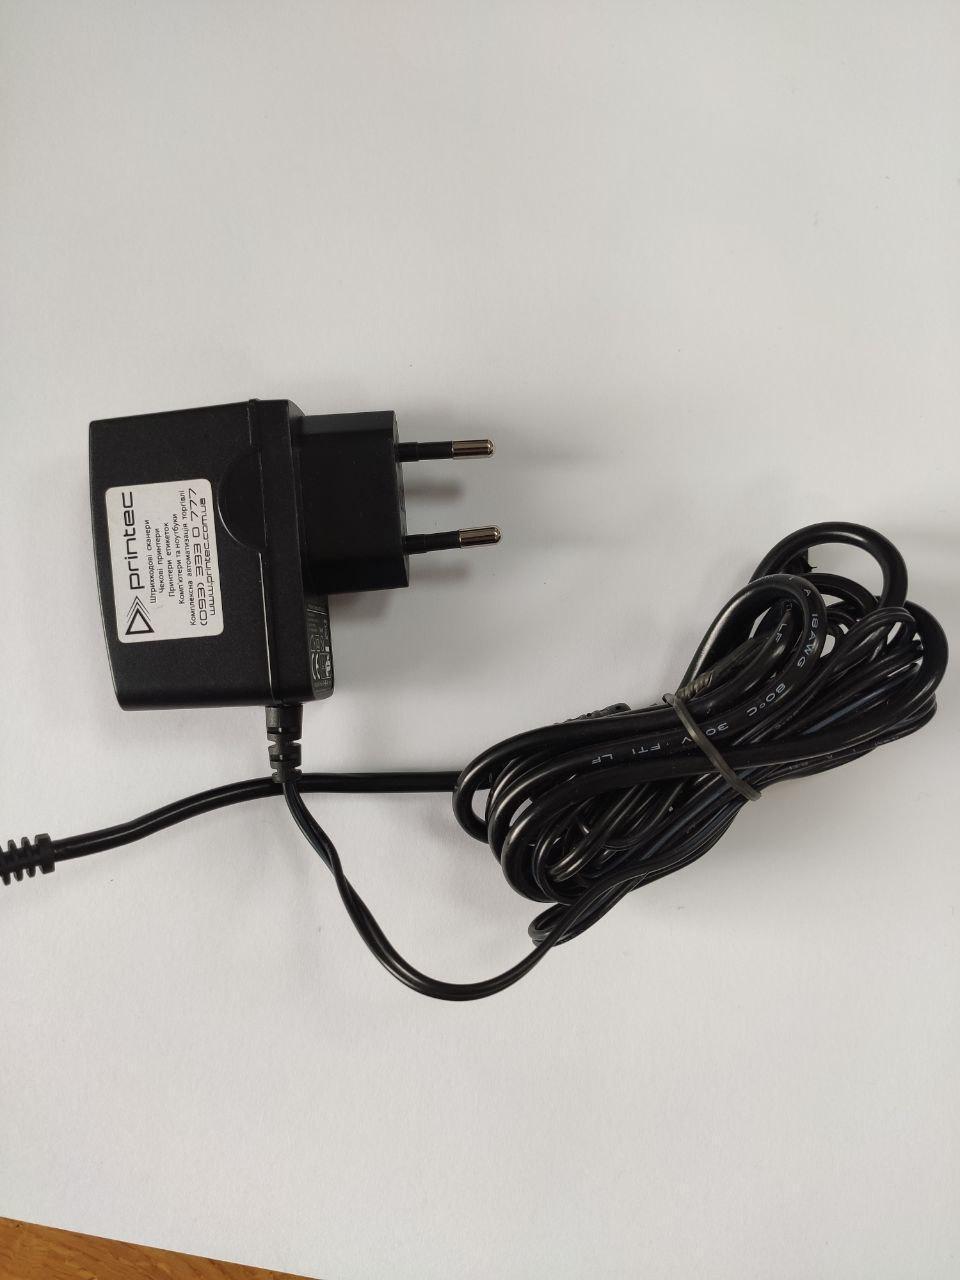 Блок живлення TP-Link T050060-20C1 5V 0.6 A 5.5x2.0mm Power Supply